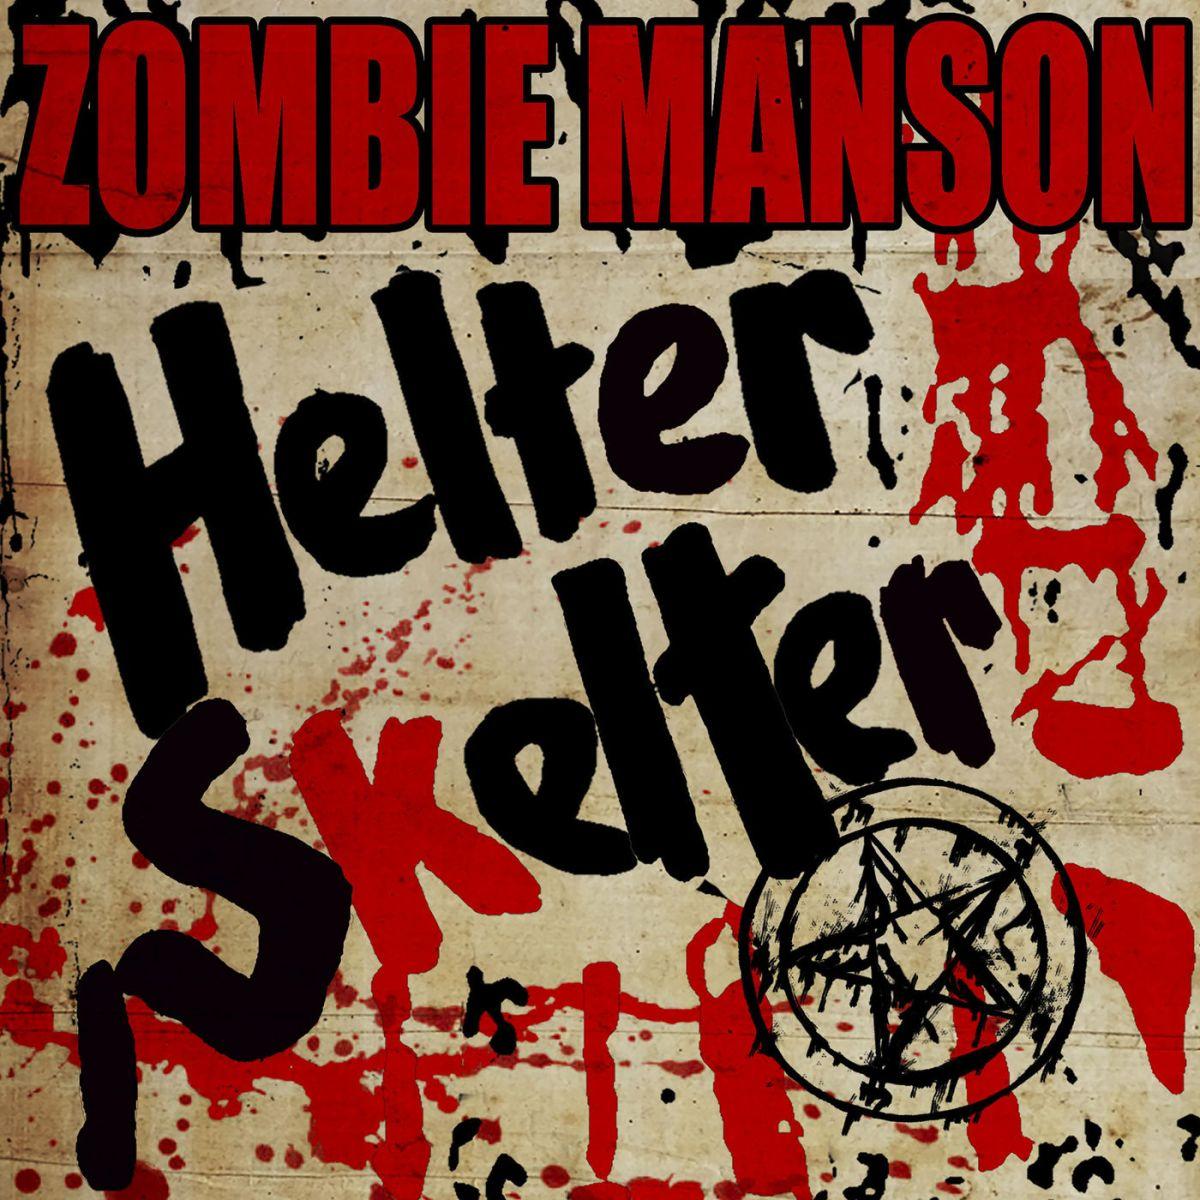 ROB ZOMBIE & MARILYN MANSON - HELTER SKELTER (BEATLES)